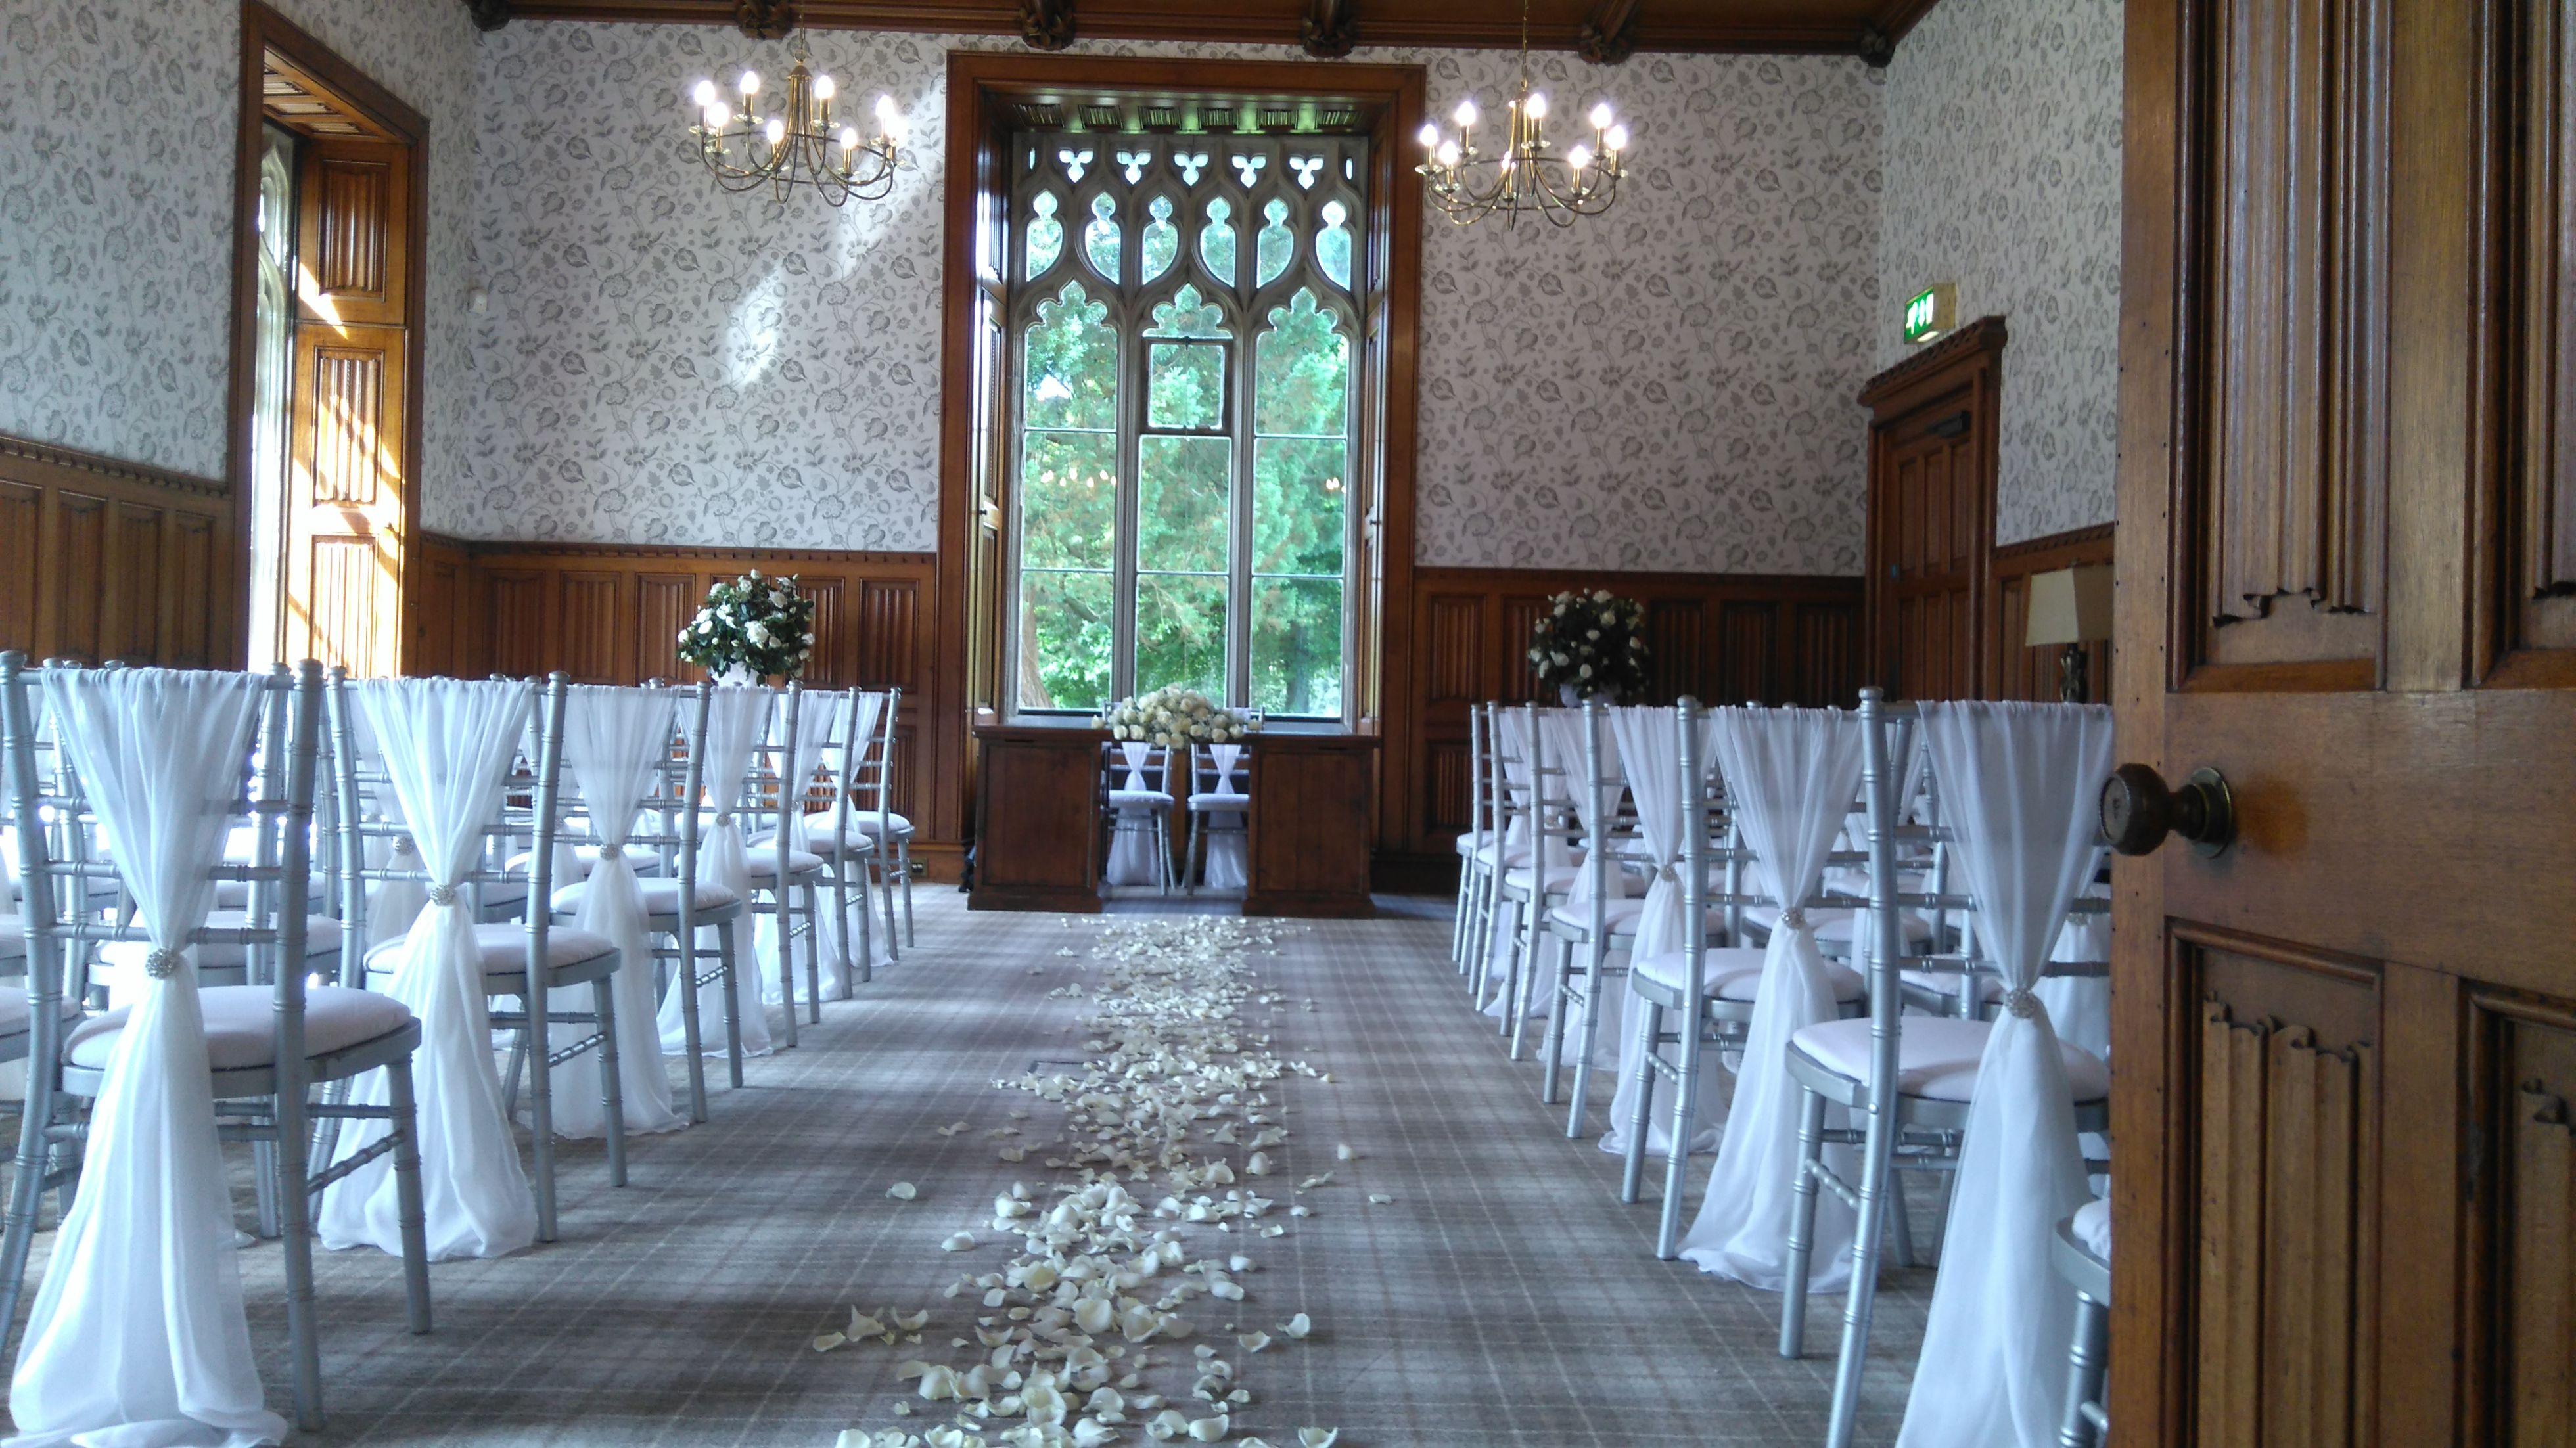 Hensol Castle Wedding Chiavari Chairs Decor Table Decorations